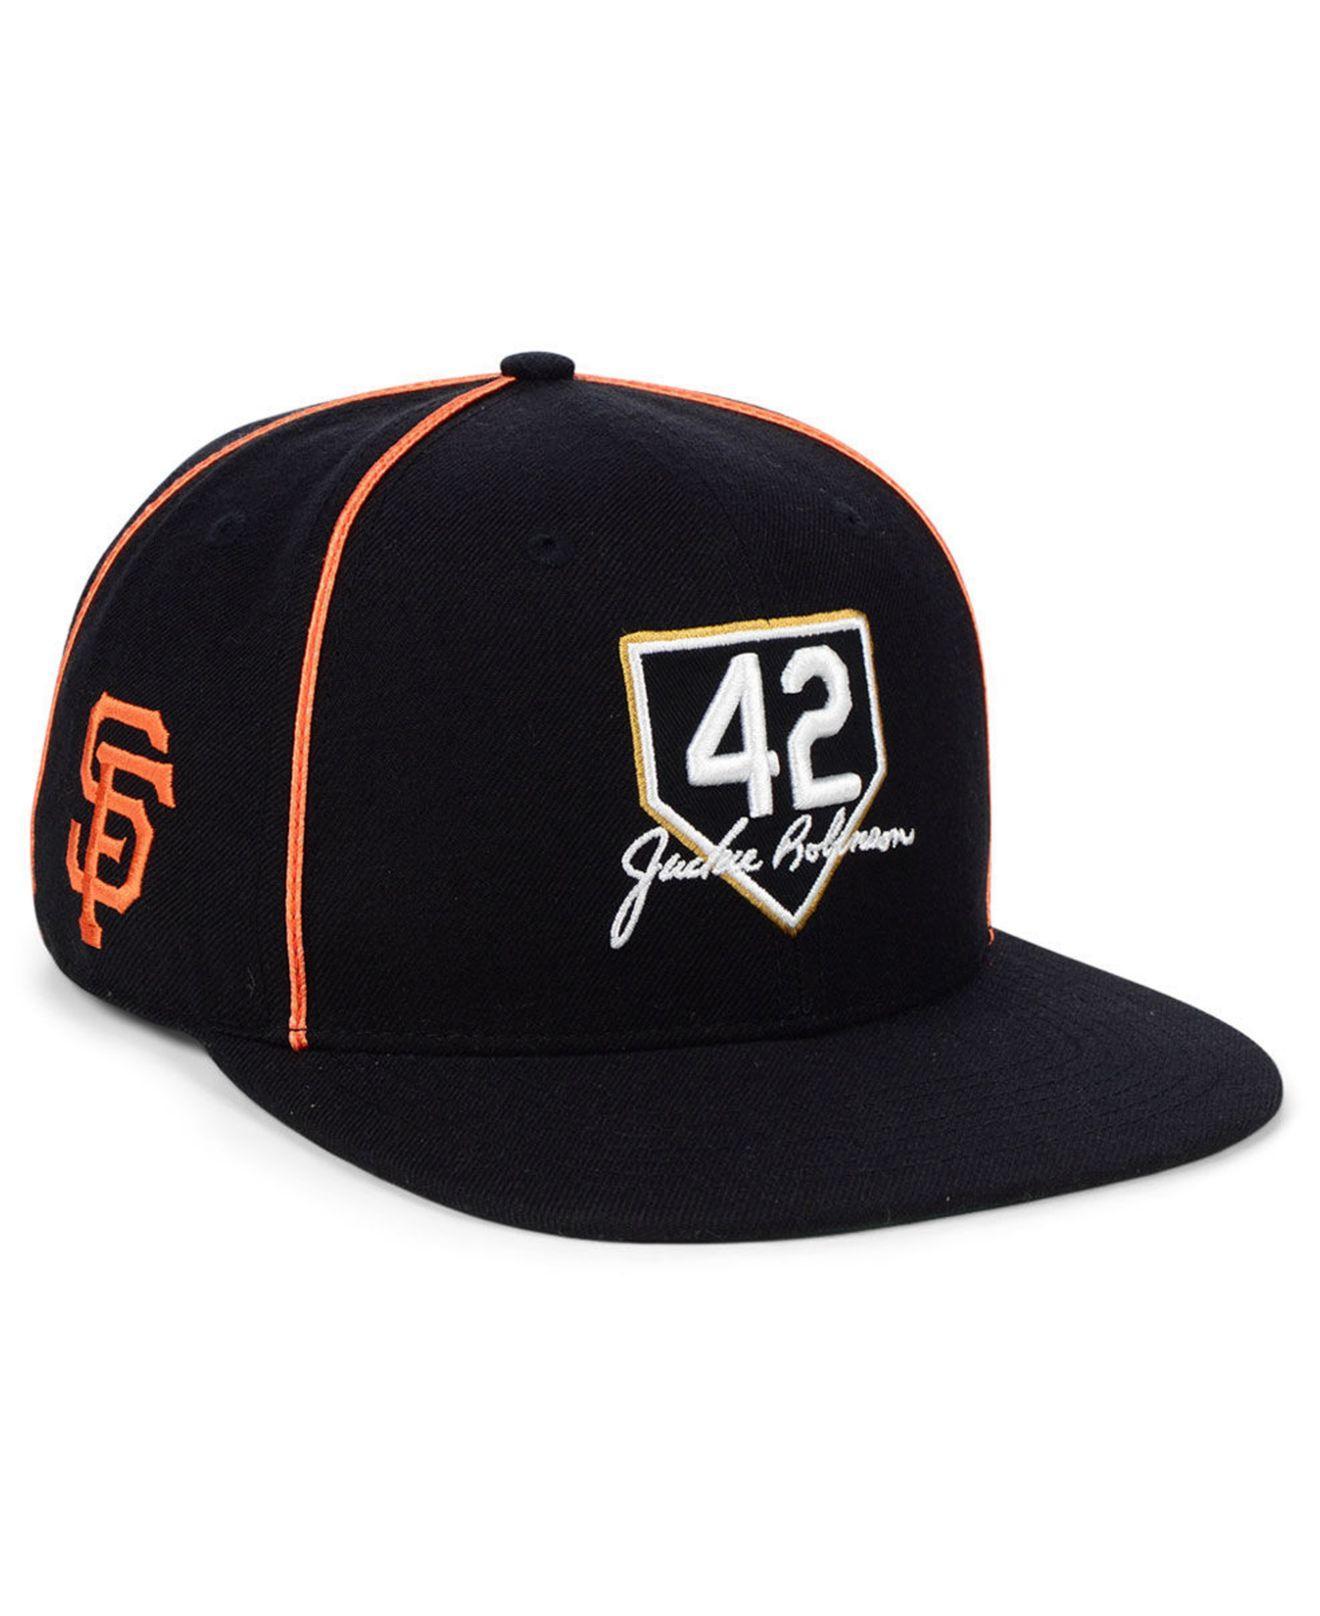 new concept 160d5 9387b 47 Brand. Men s Black San Francisco Giants Jackie Robinson 42 Team Snapback  Cap